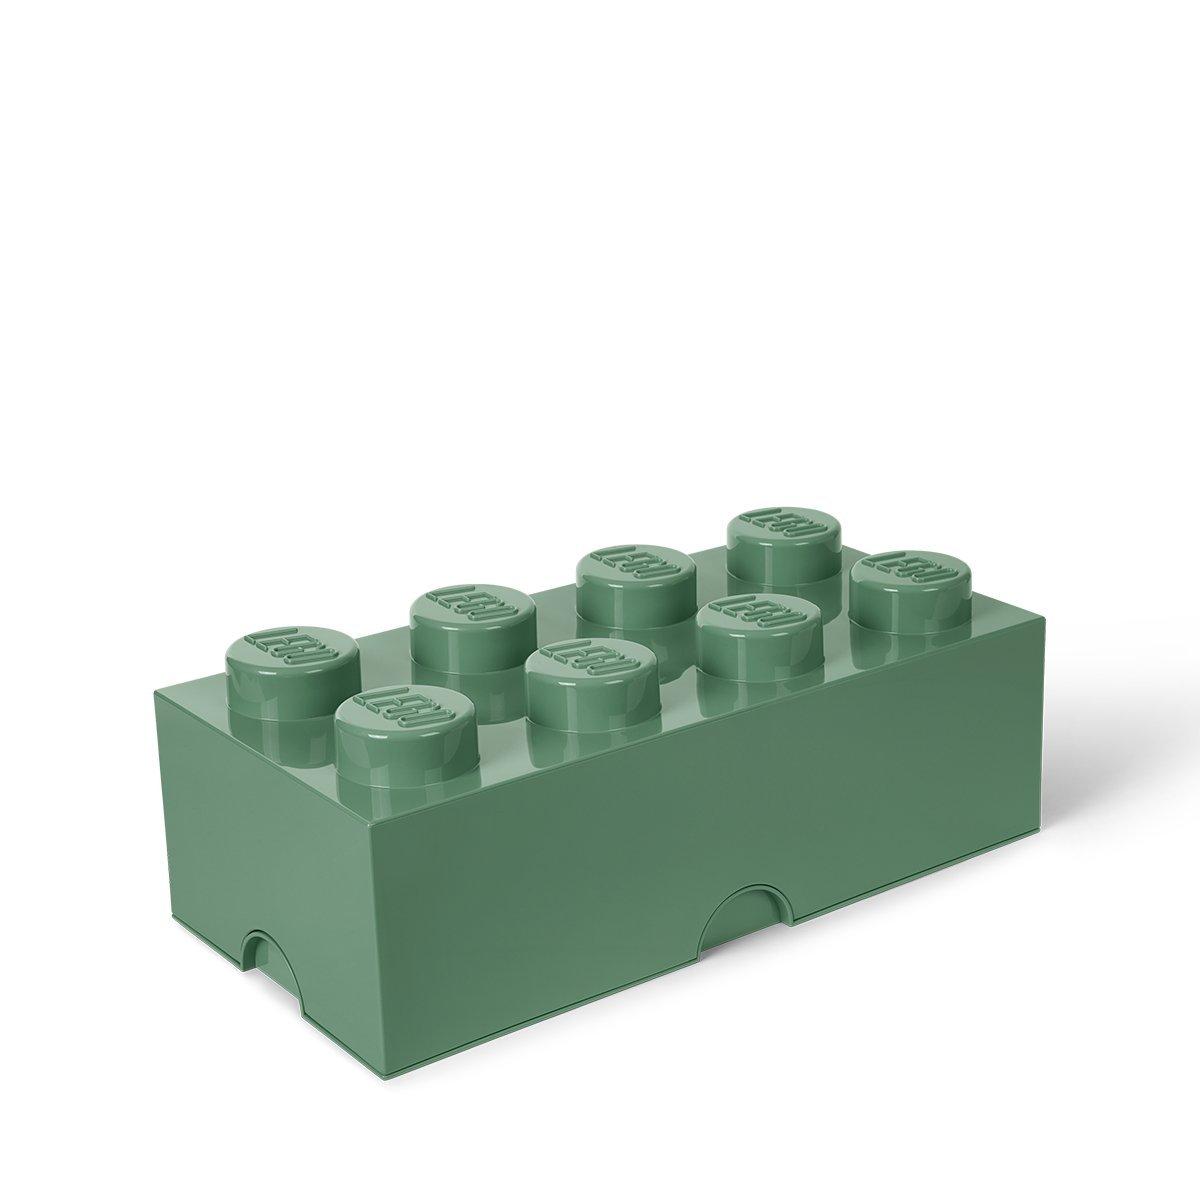 LEGO Storage Brick 8 Black Room Copenhagen 40040633 Accessory Consumer Accessories